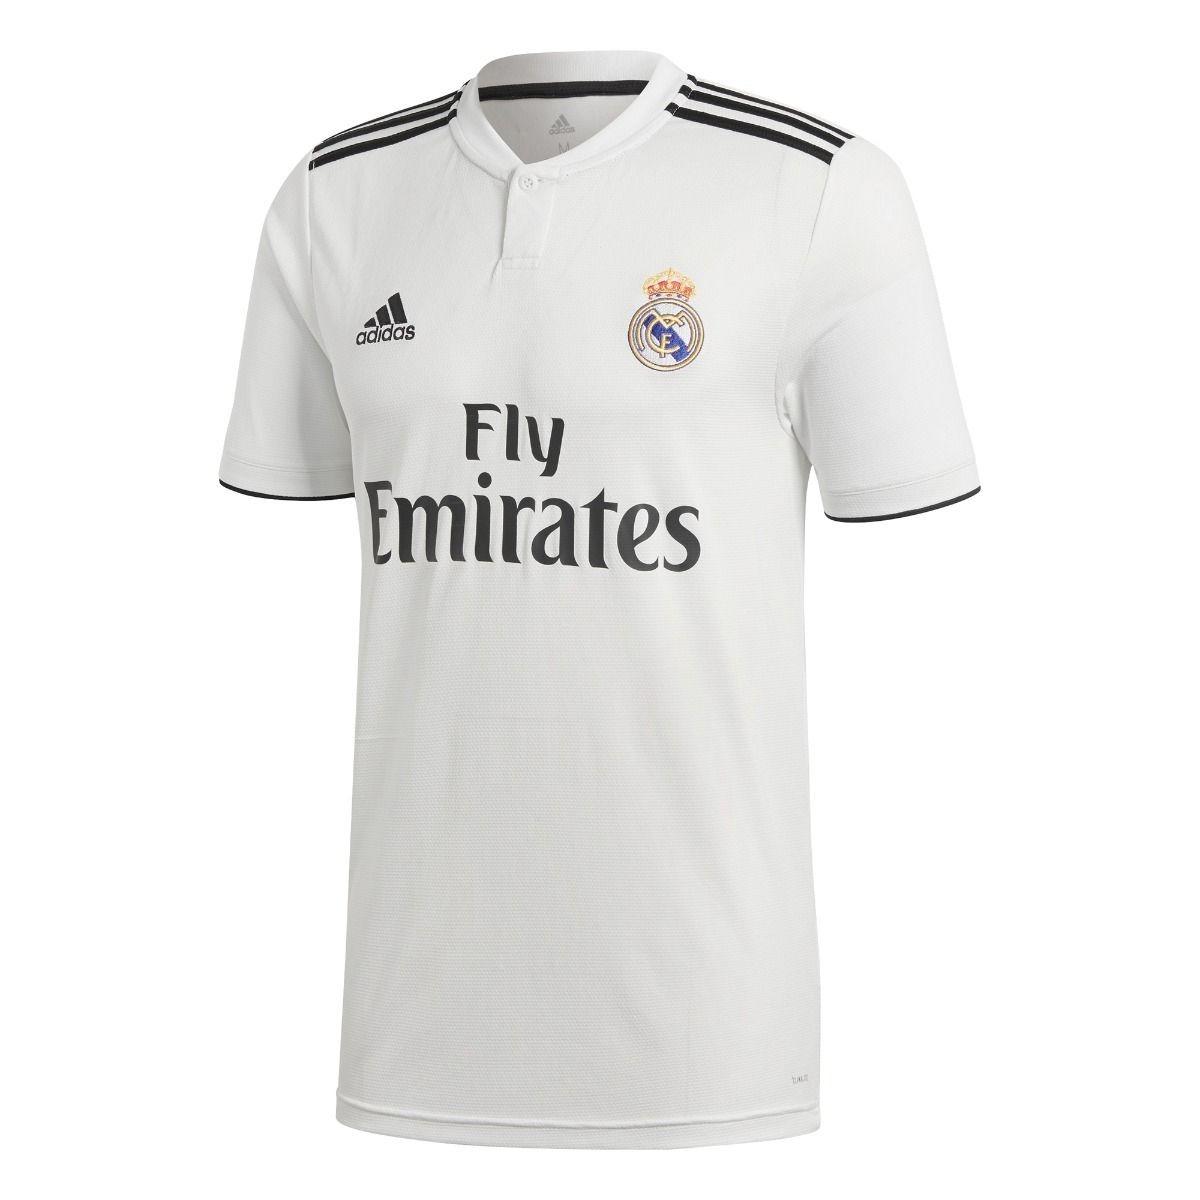 2dc0cb4298f0c jersey adidas real madrid local 2018 dh3372 réplica original. Cargando zoom.